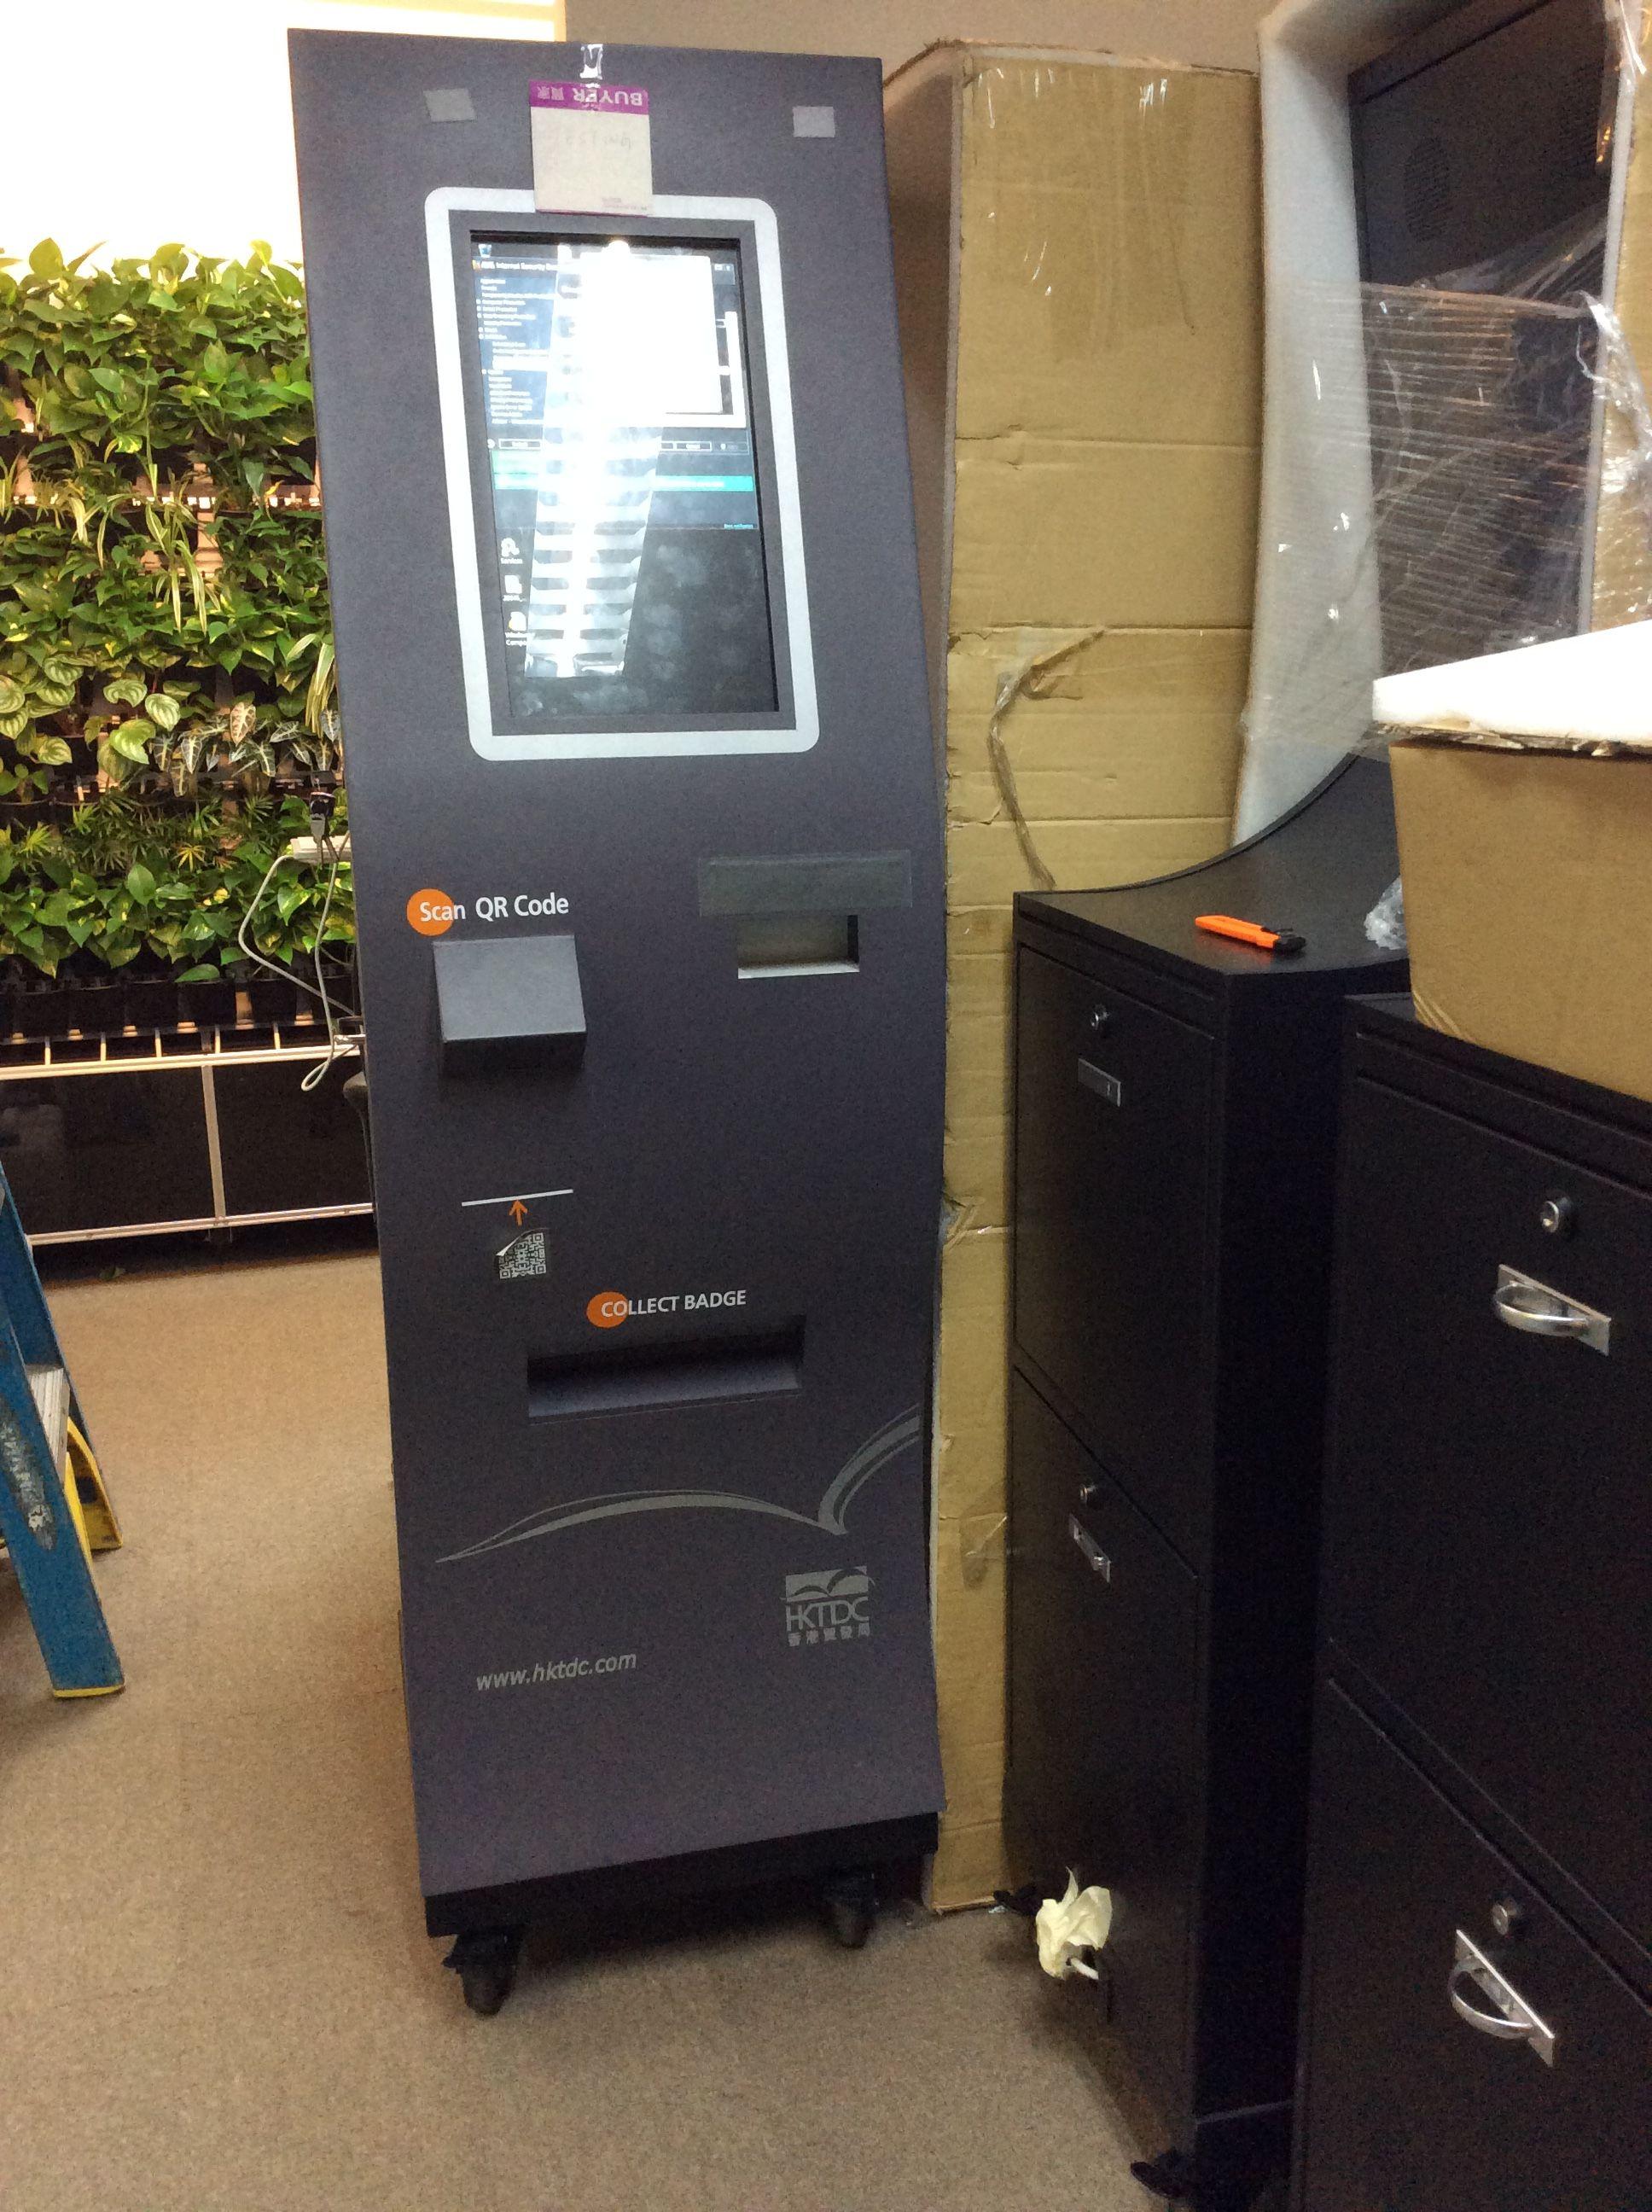 Pin on Kiosks / Vending Machine / ATM